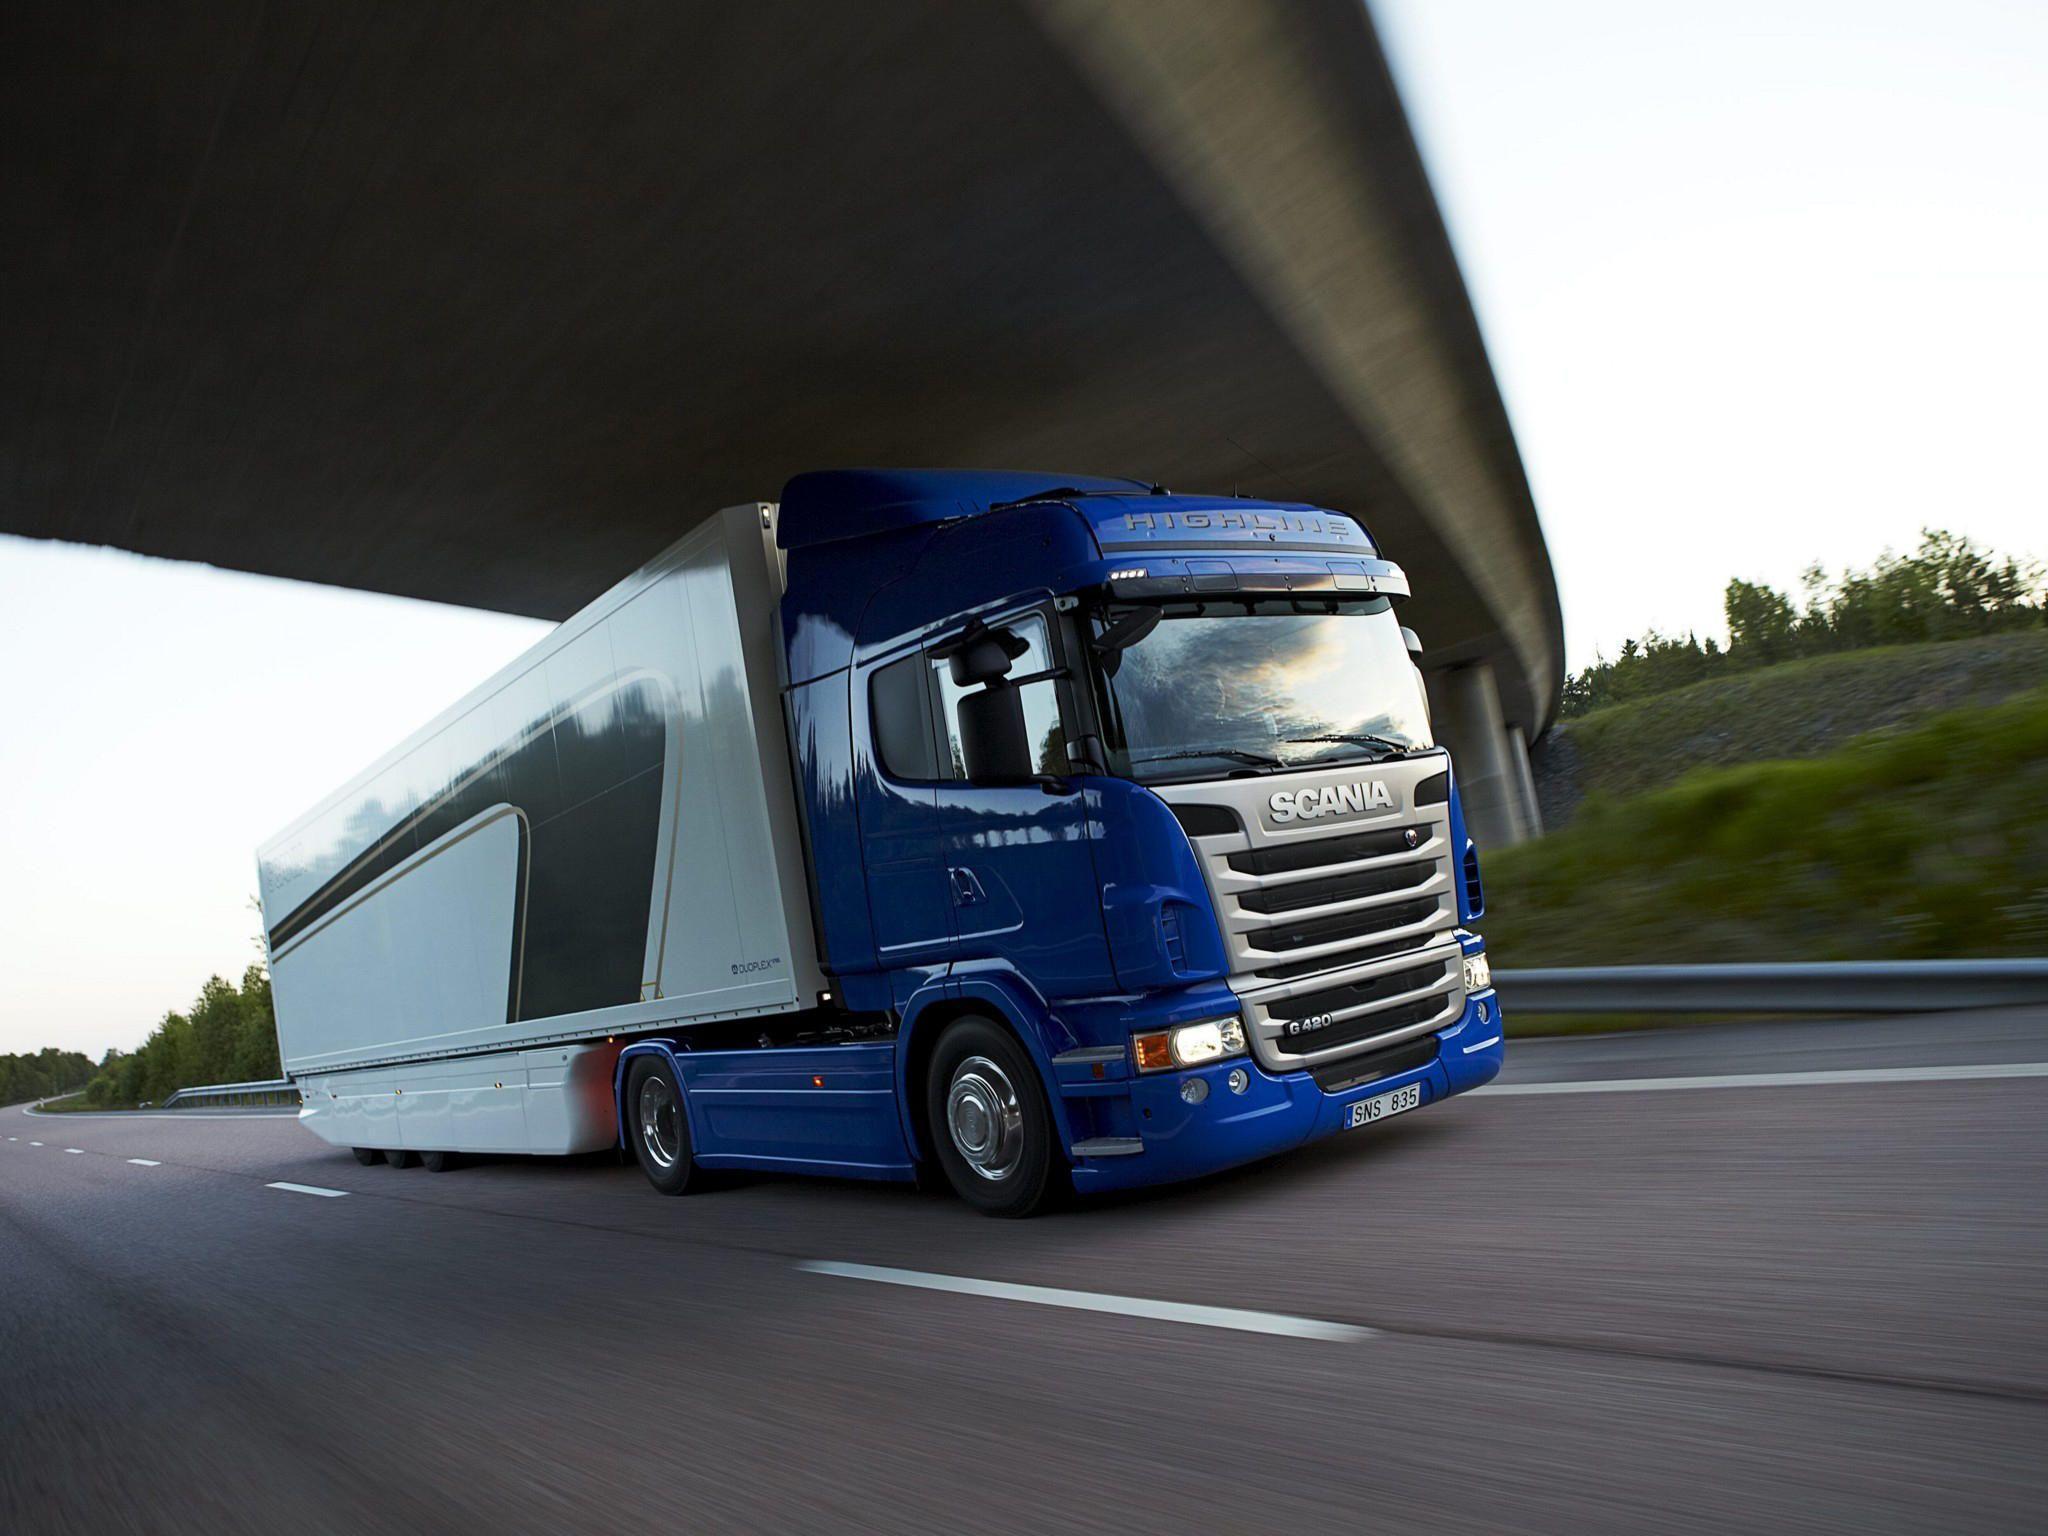 best truck wallpapers - photo #44